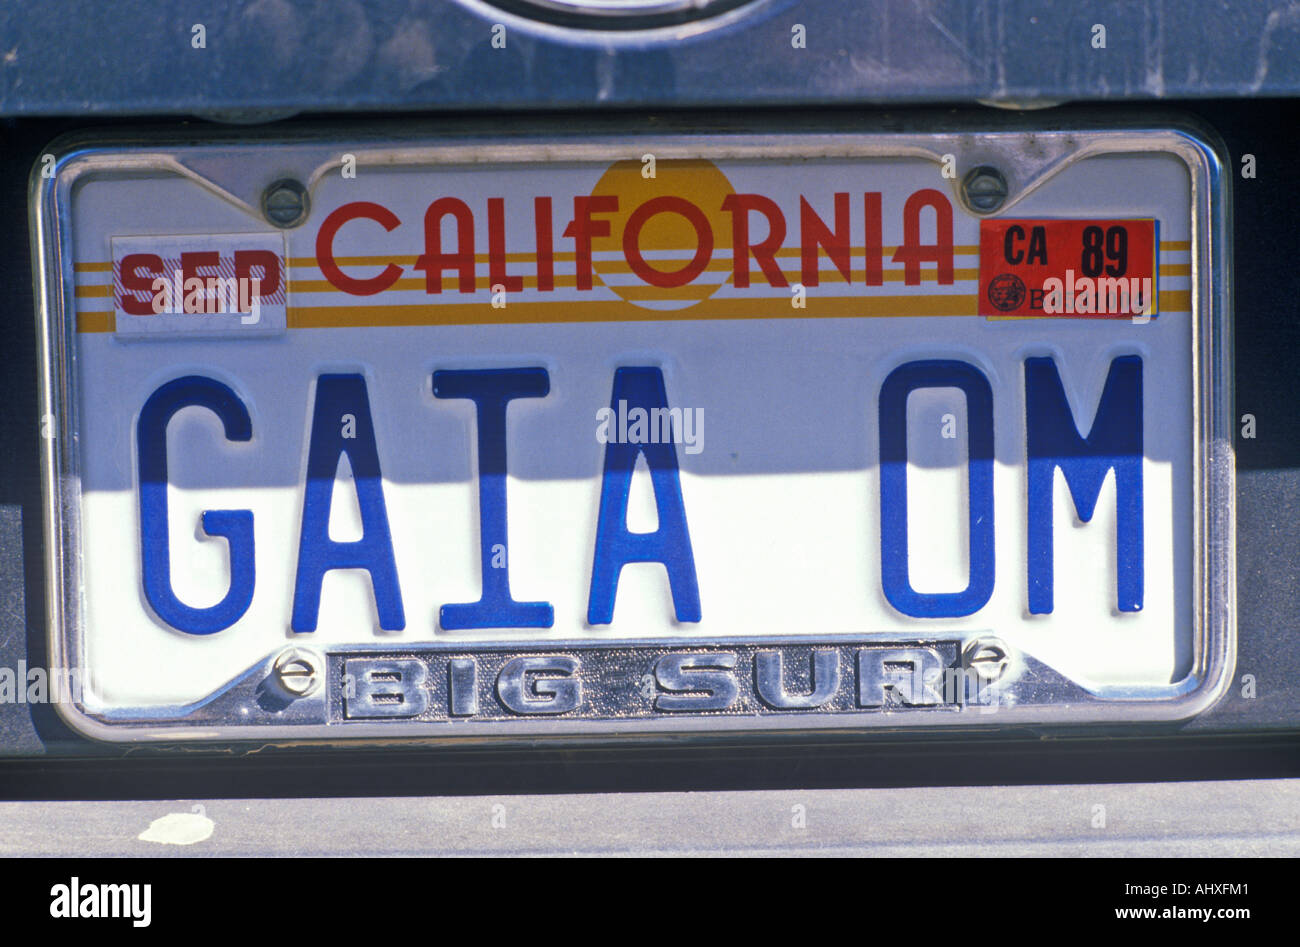 Vanity License Plate California - Stock Image